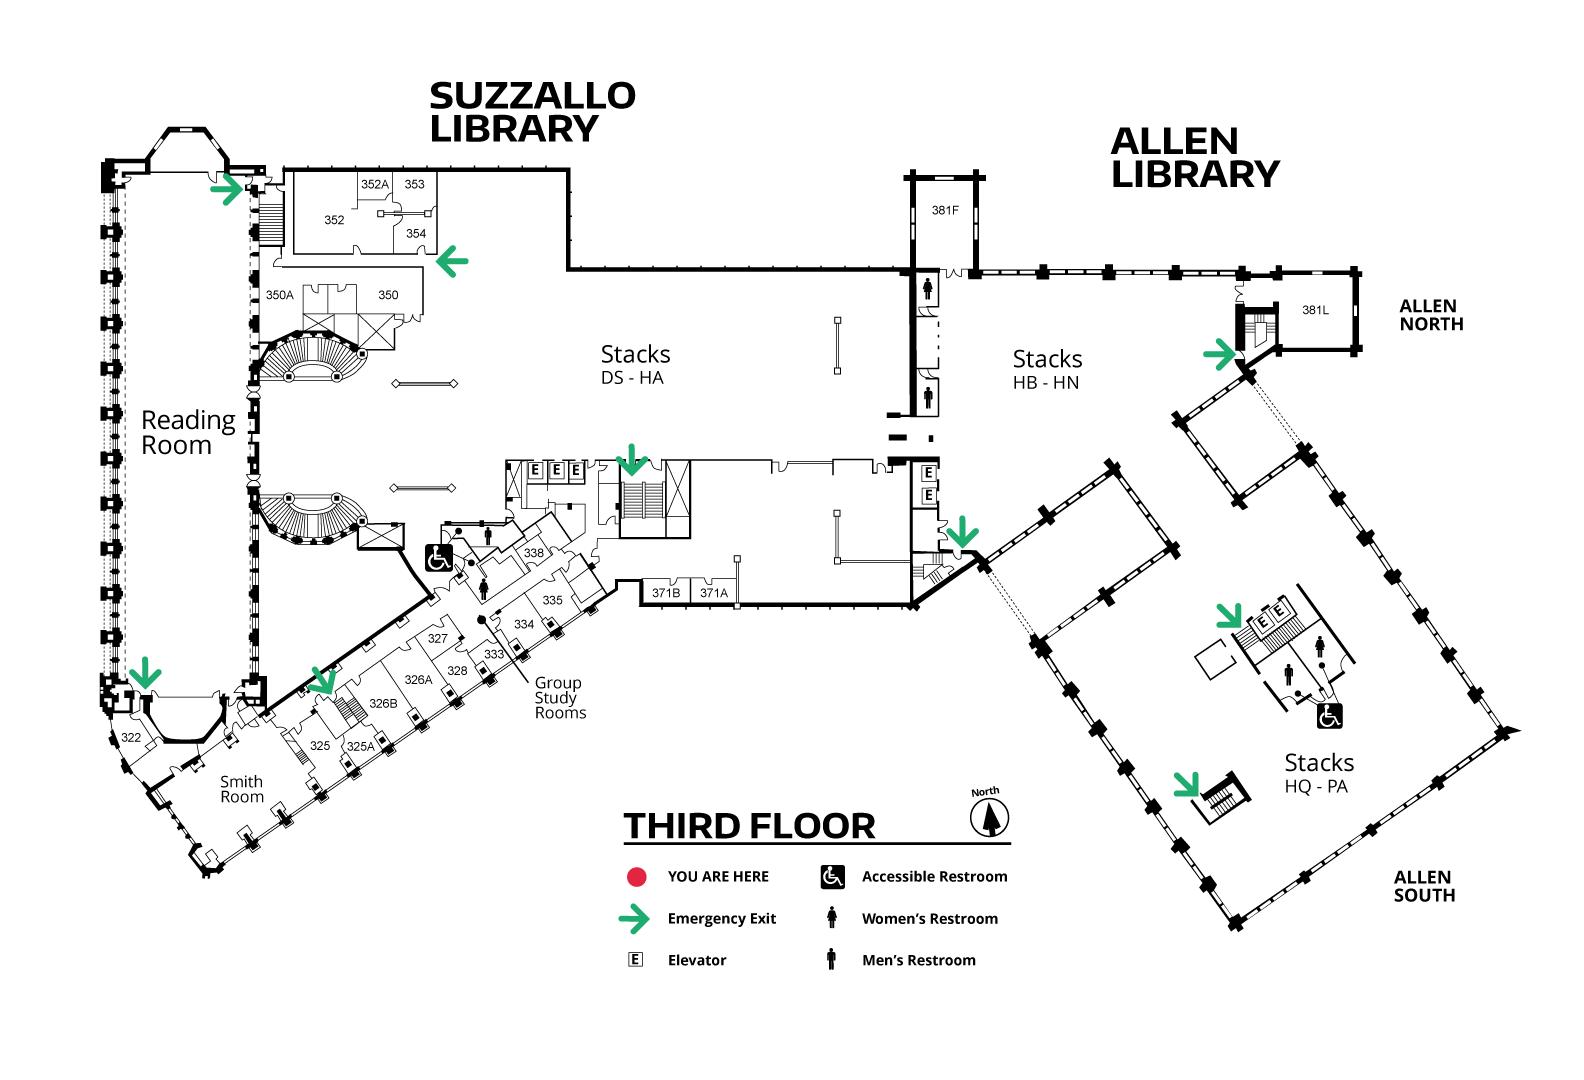 Suzzallo/Allen Third Floor Map